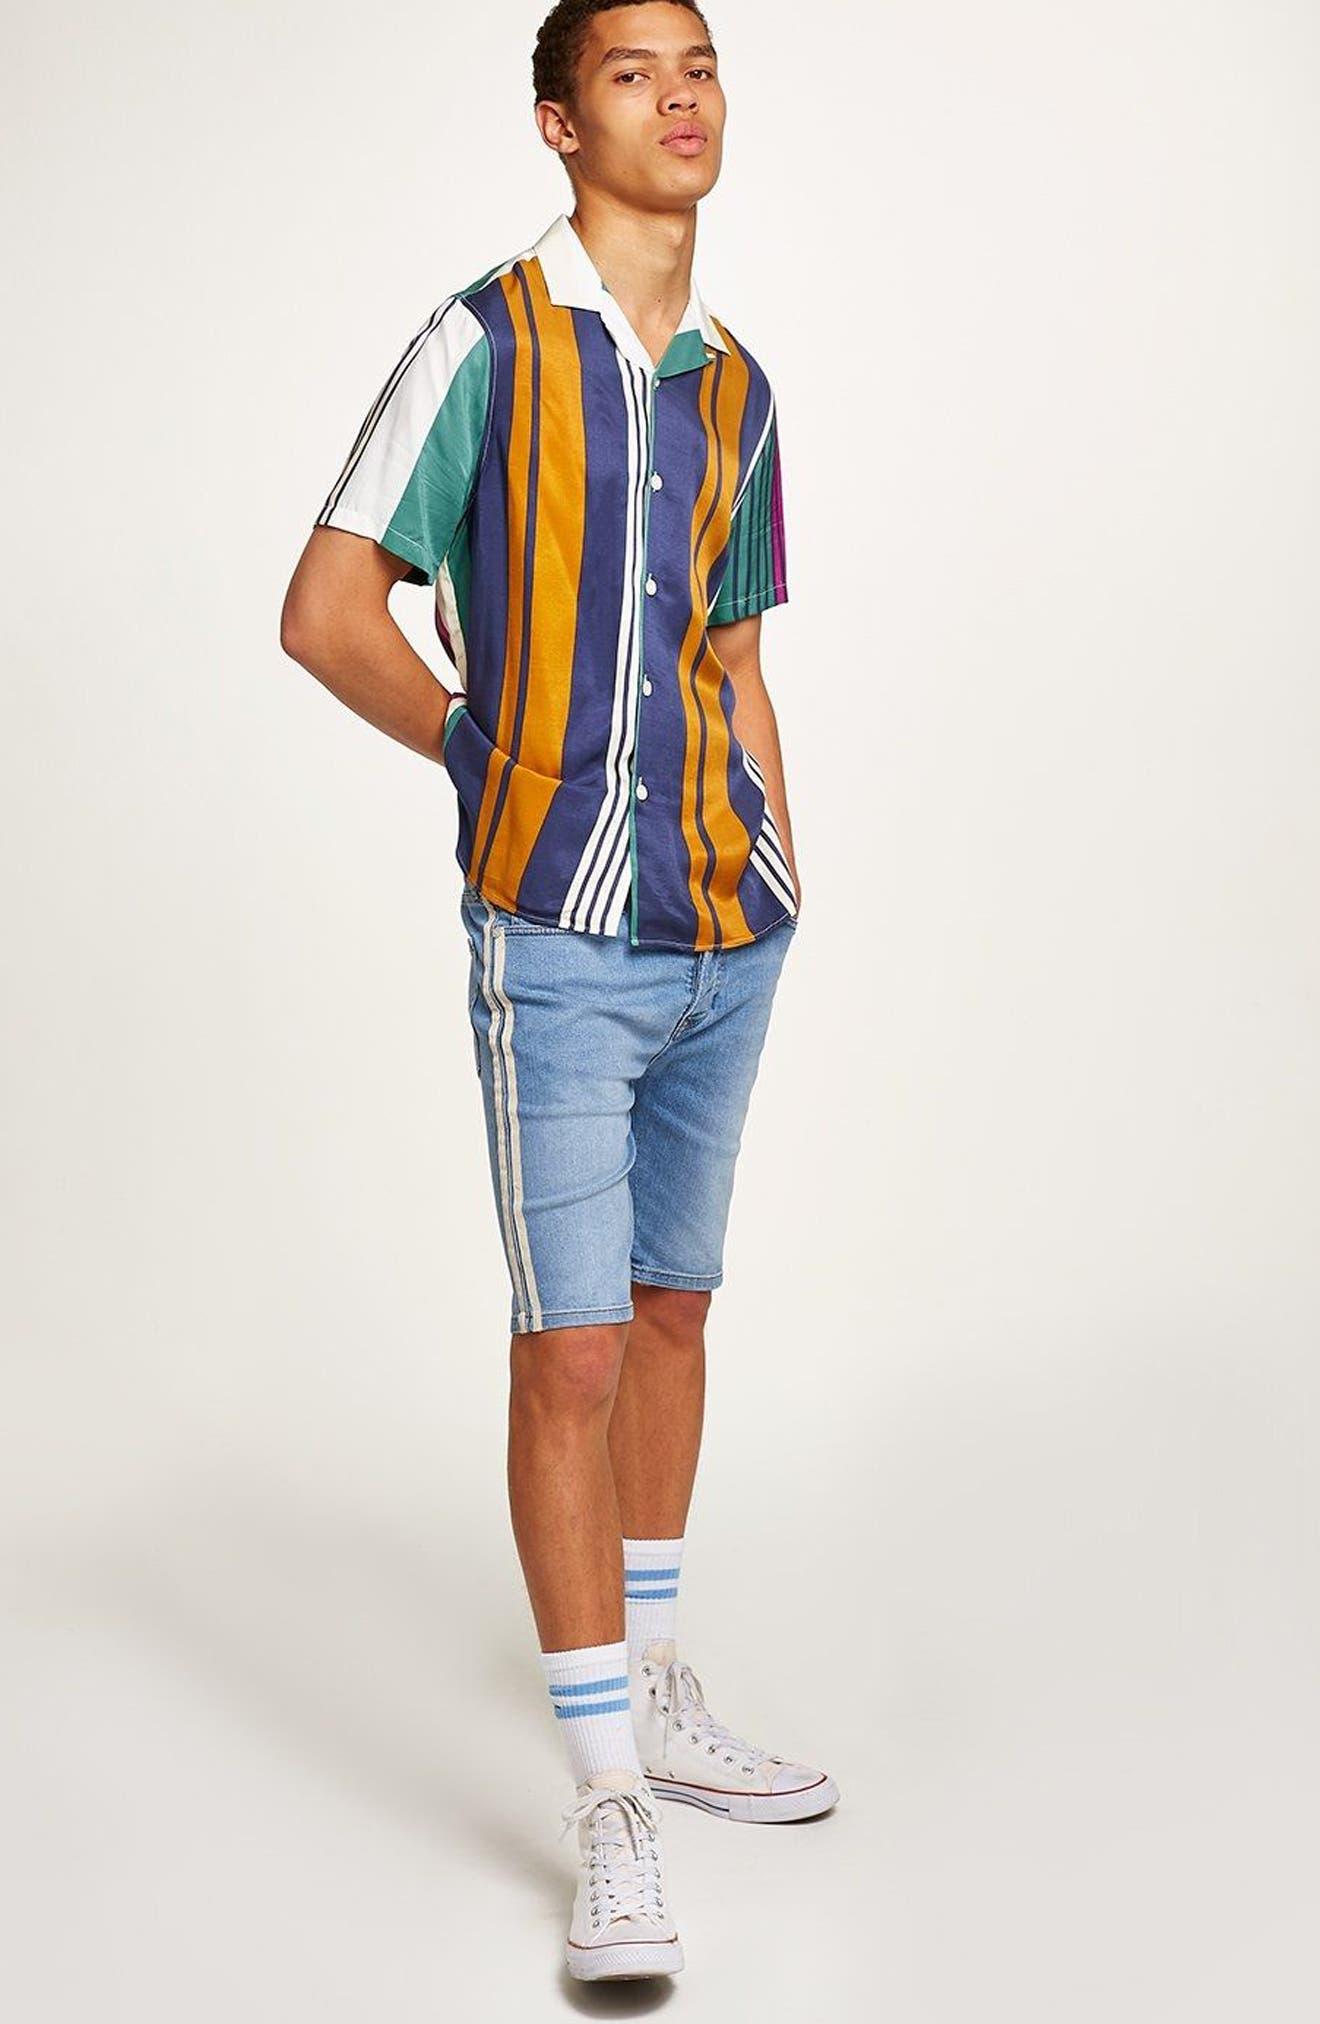 Tape Stretch Skinny Fit Denim Shorts,                             Alternate thumbnail 4, color,                             Blue